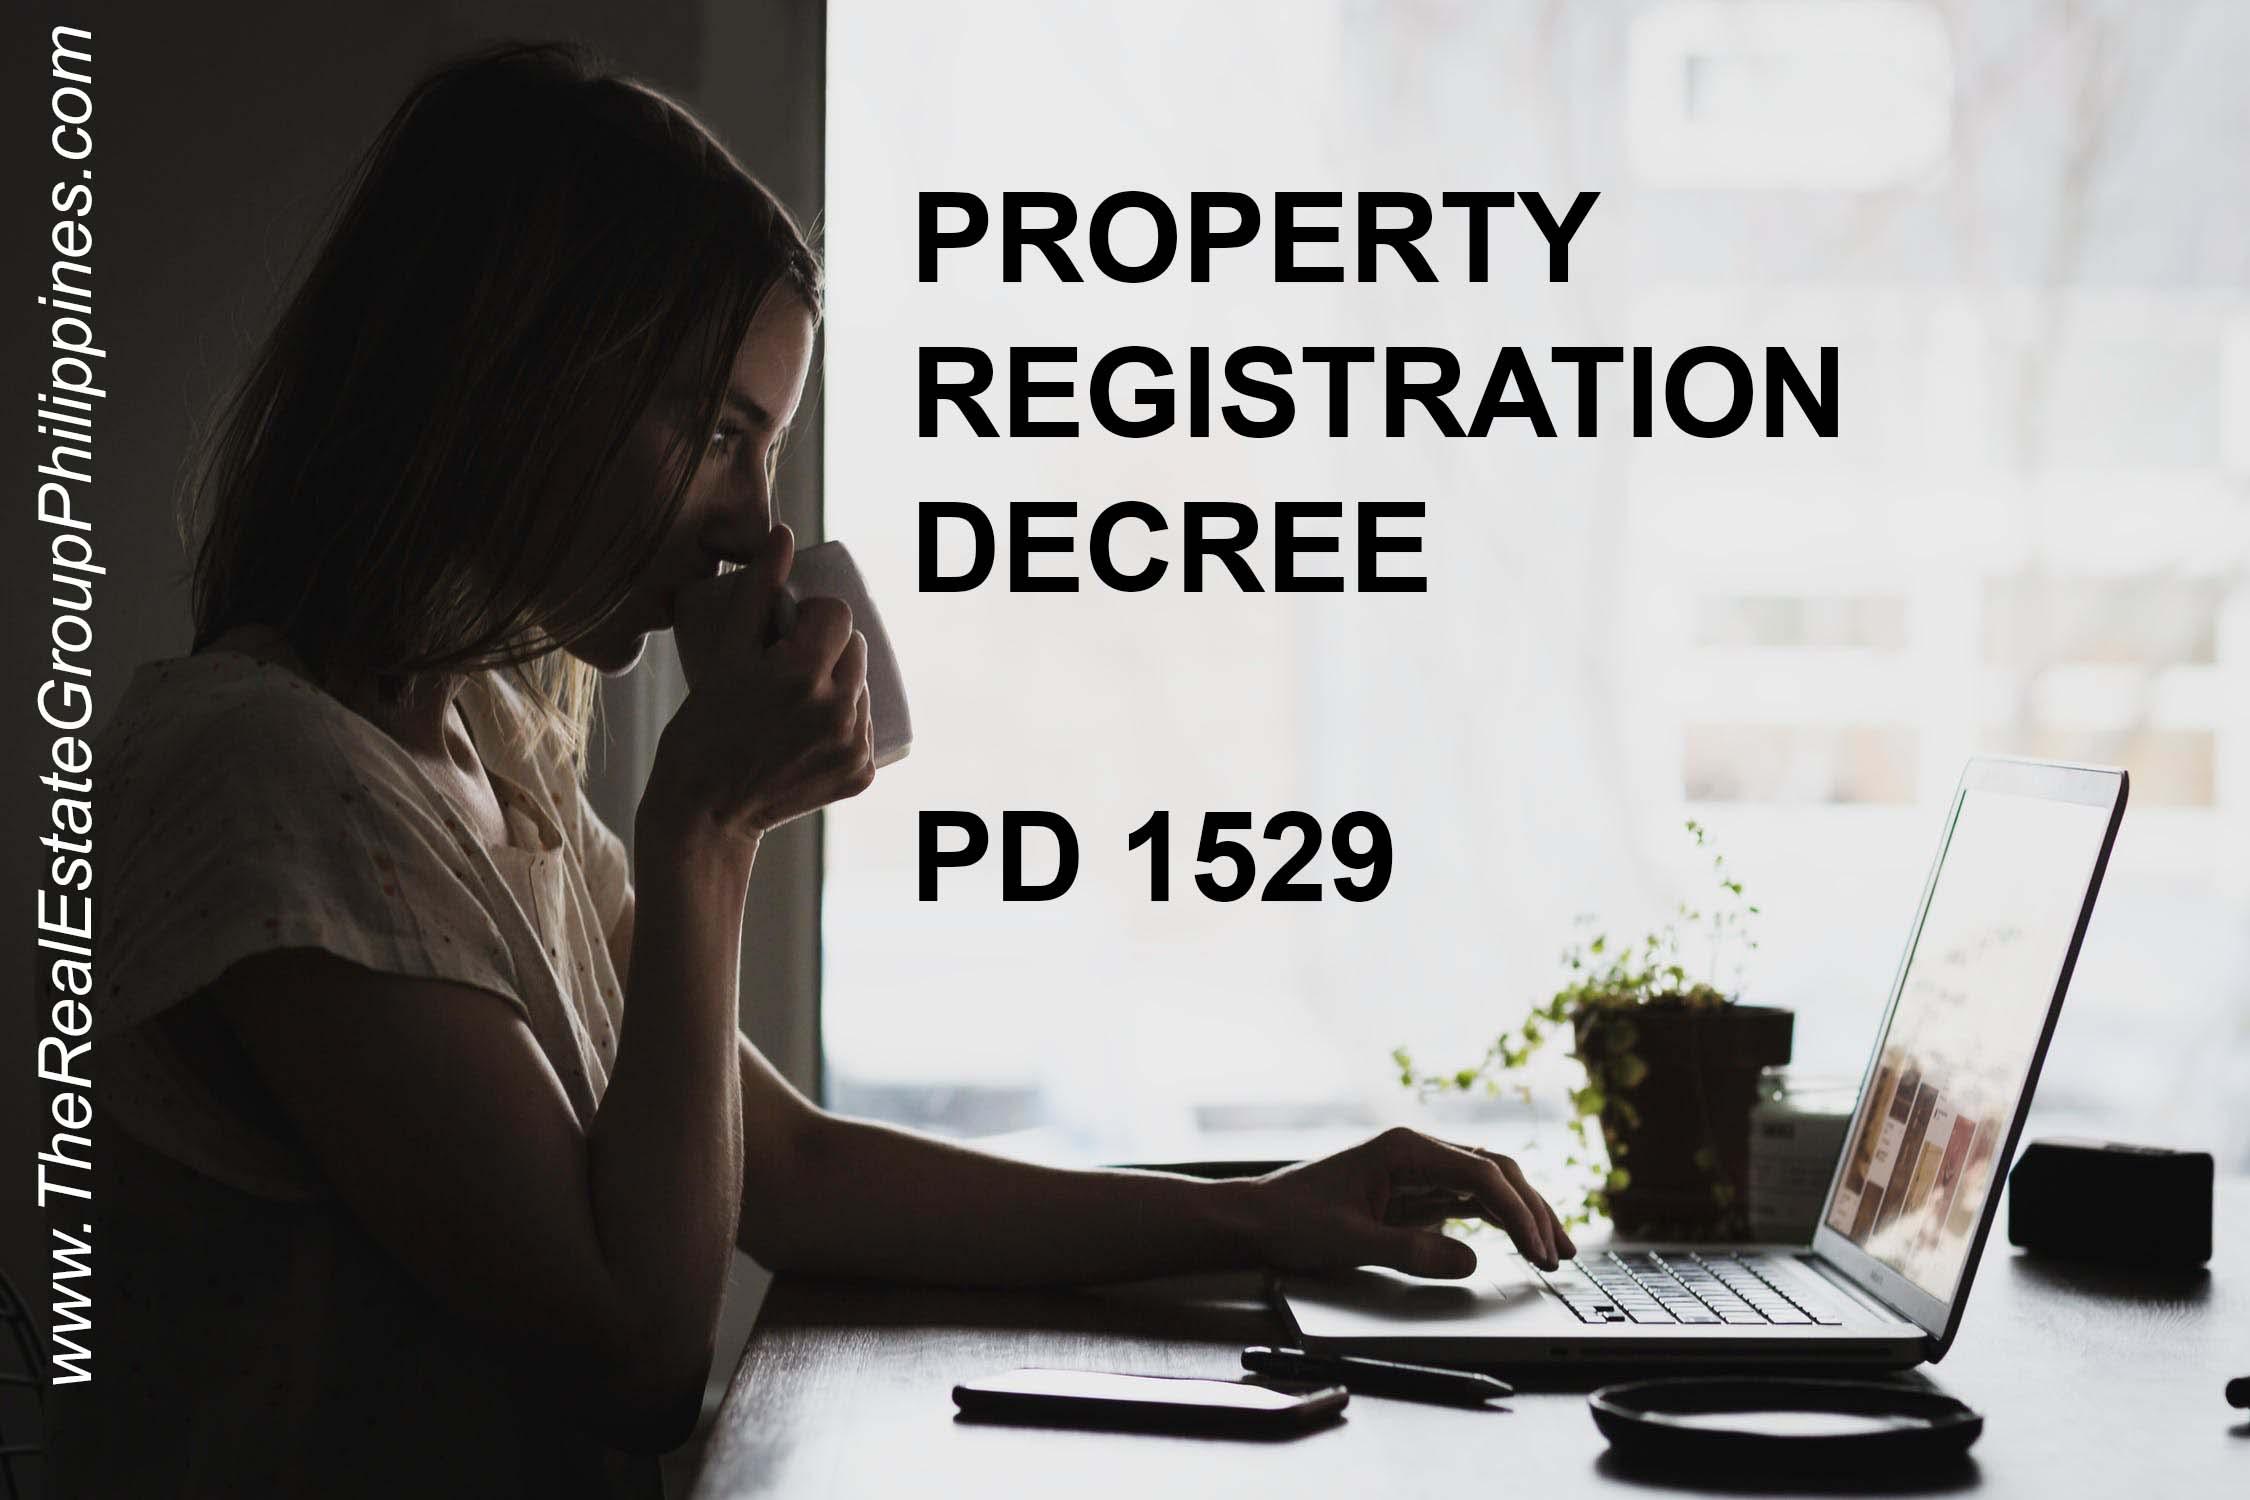 PROPERTY REGISTRATION DECREE | PD 1529